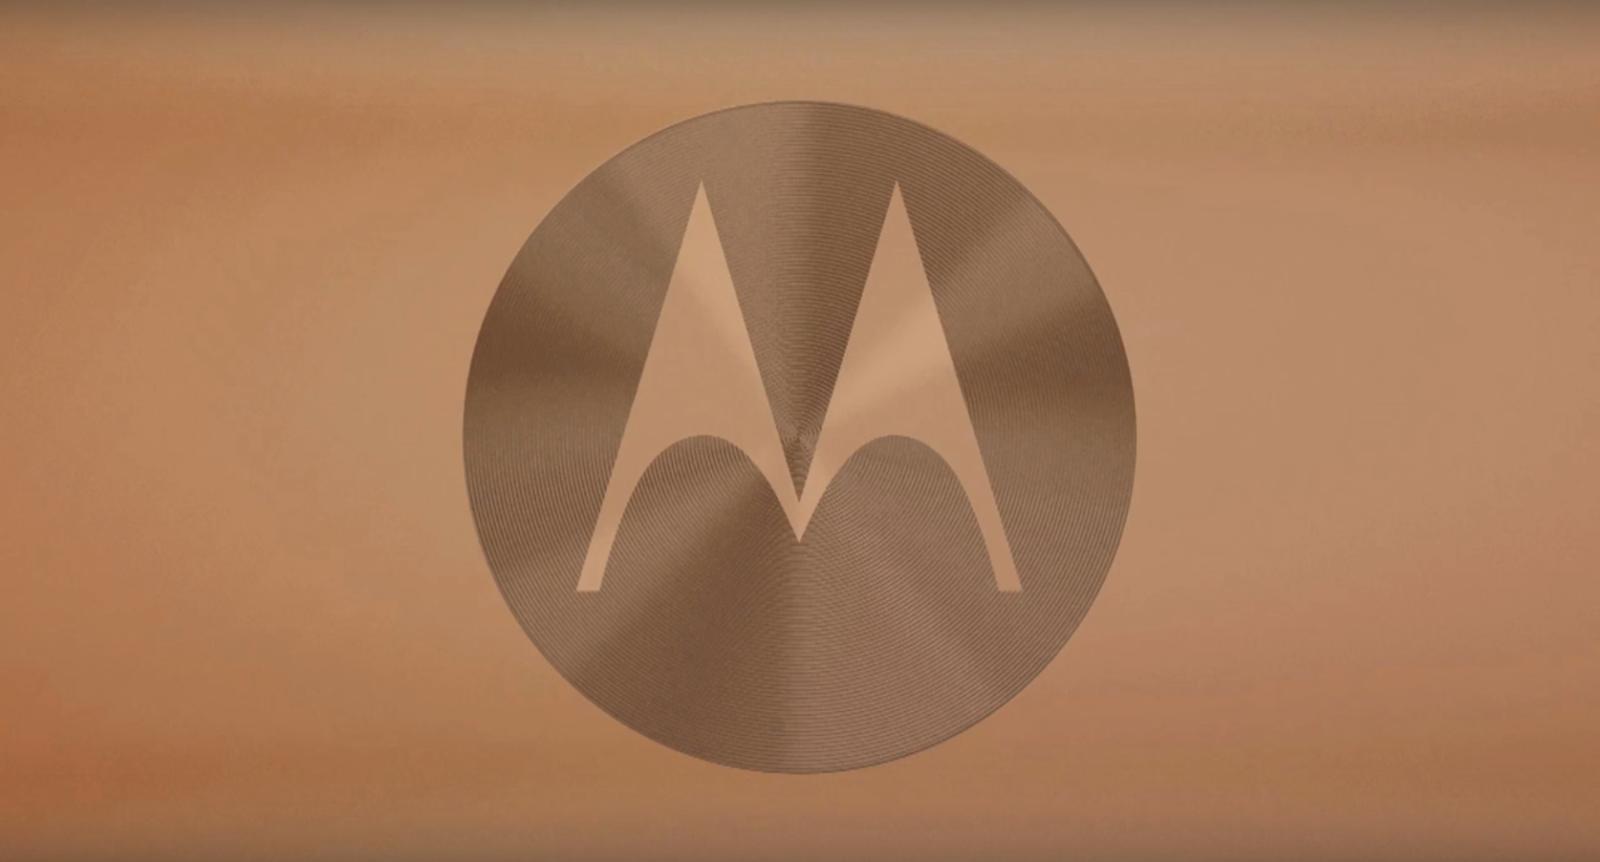 Motorola Orbit New Vervelife And Signature Series To Be